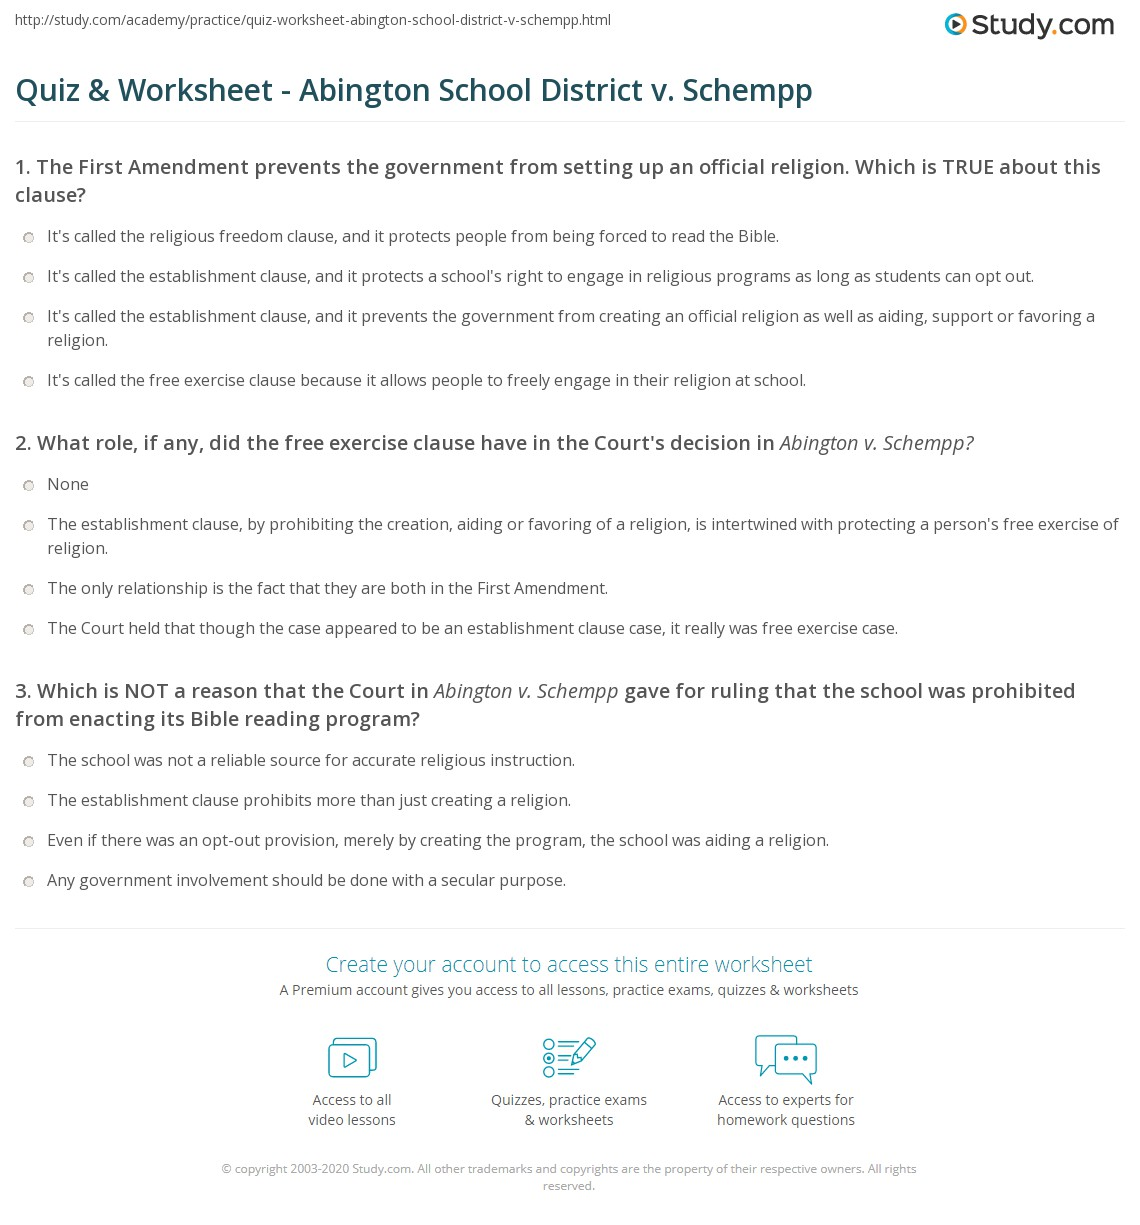 abington school district vs schempp